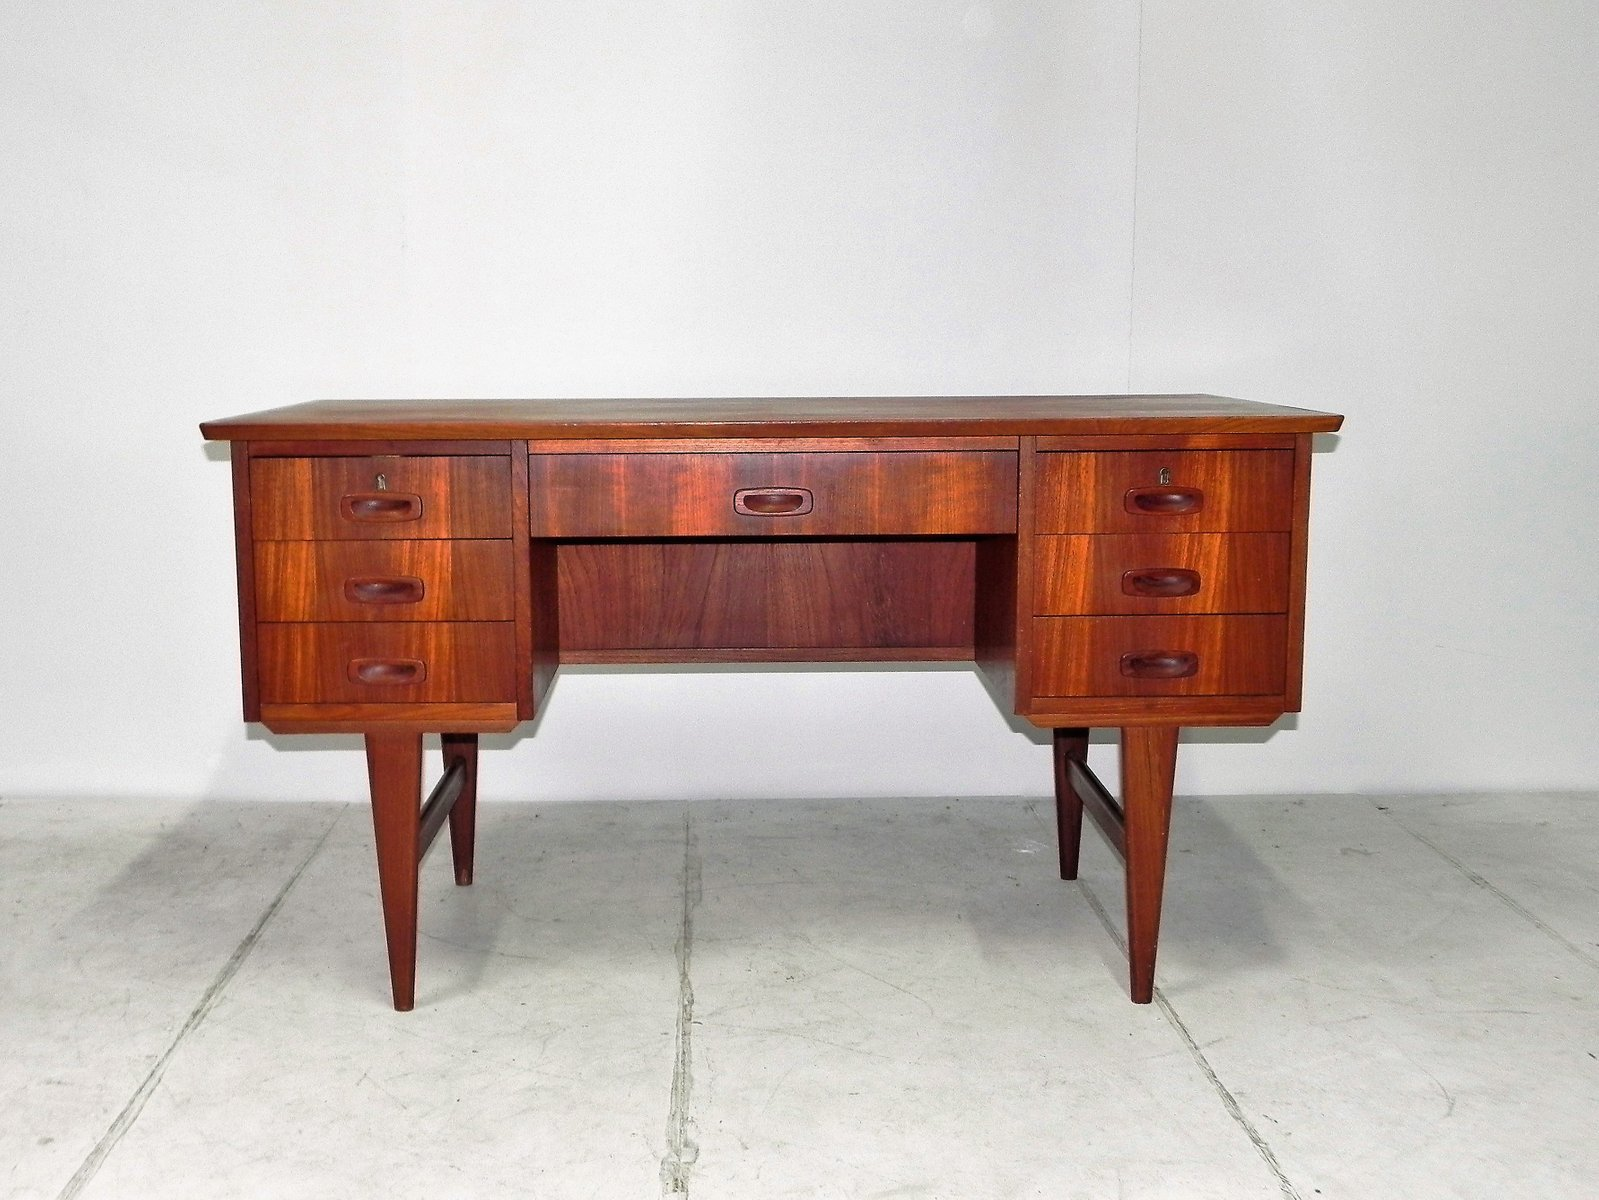 Scandinavian Desks vintage scandinavian desk in teak with two compartments for sale